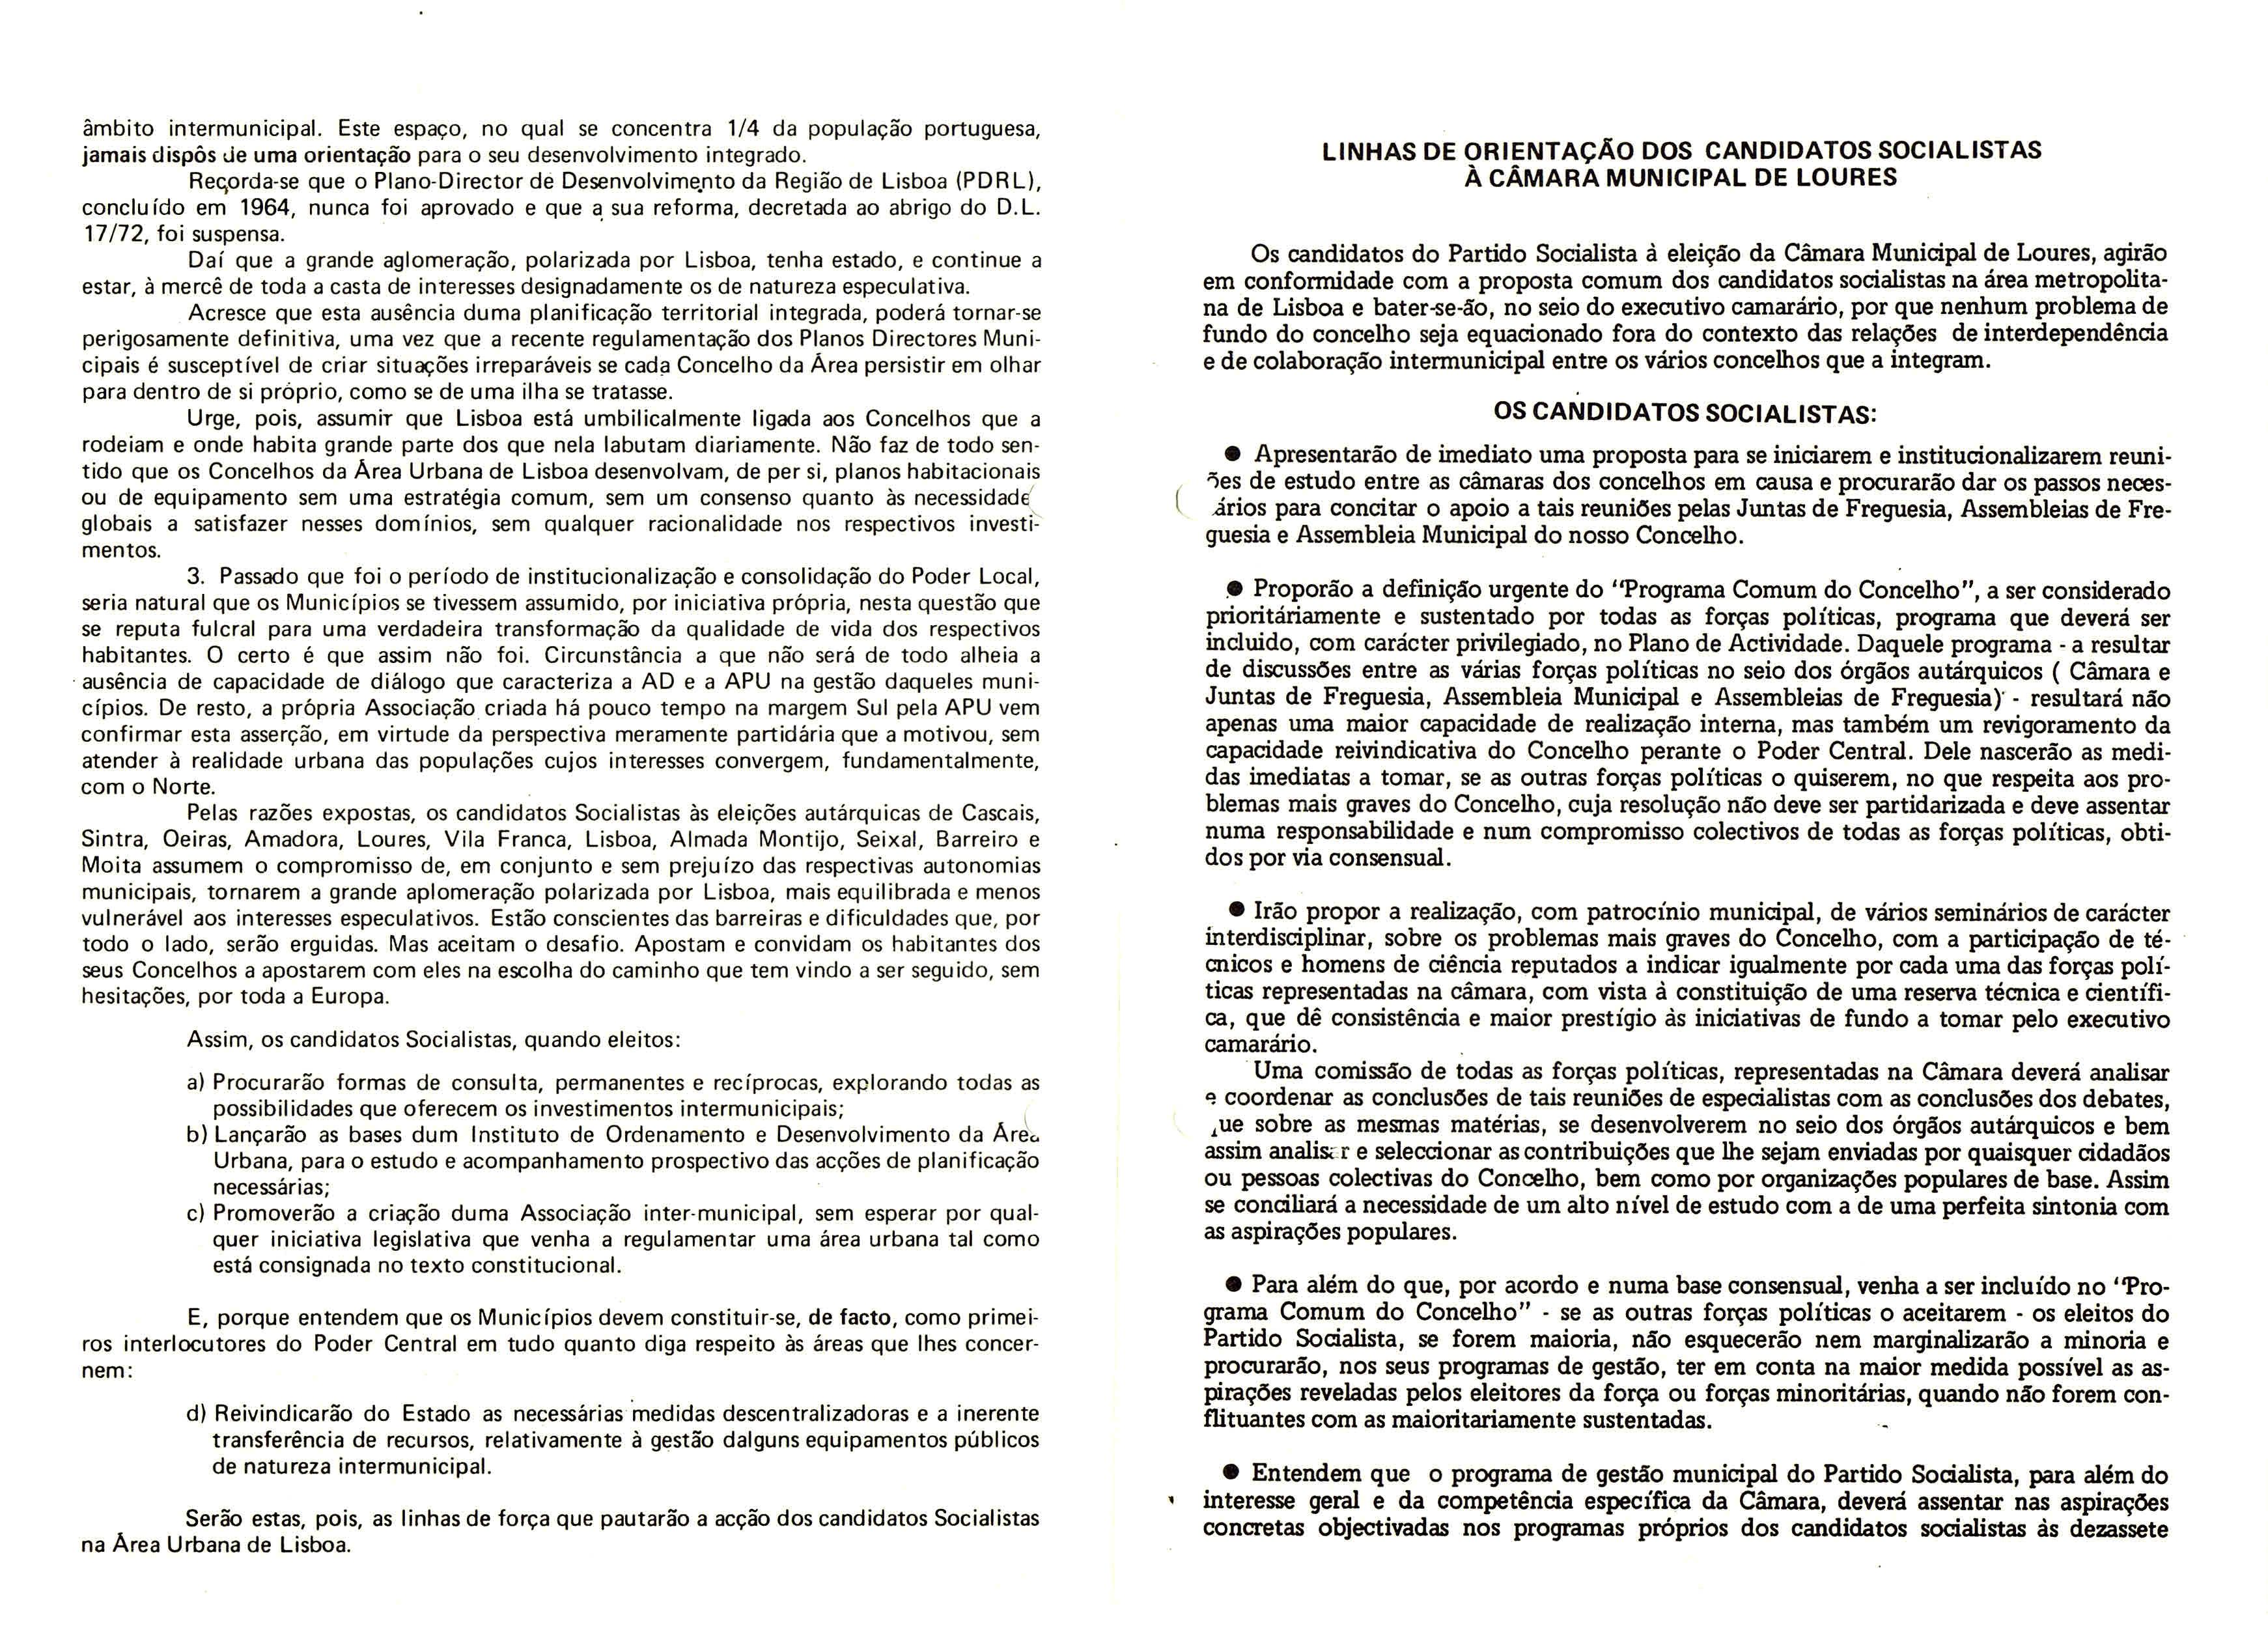 PS LOURES AUTÁRQUICAS 1982 MANIFESTO 2